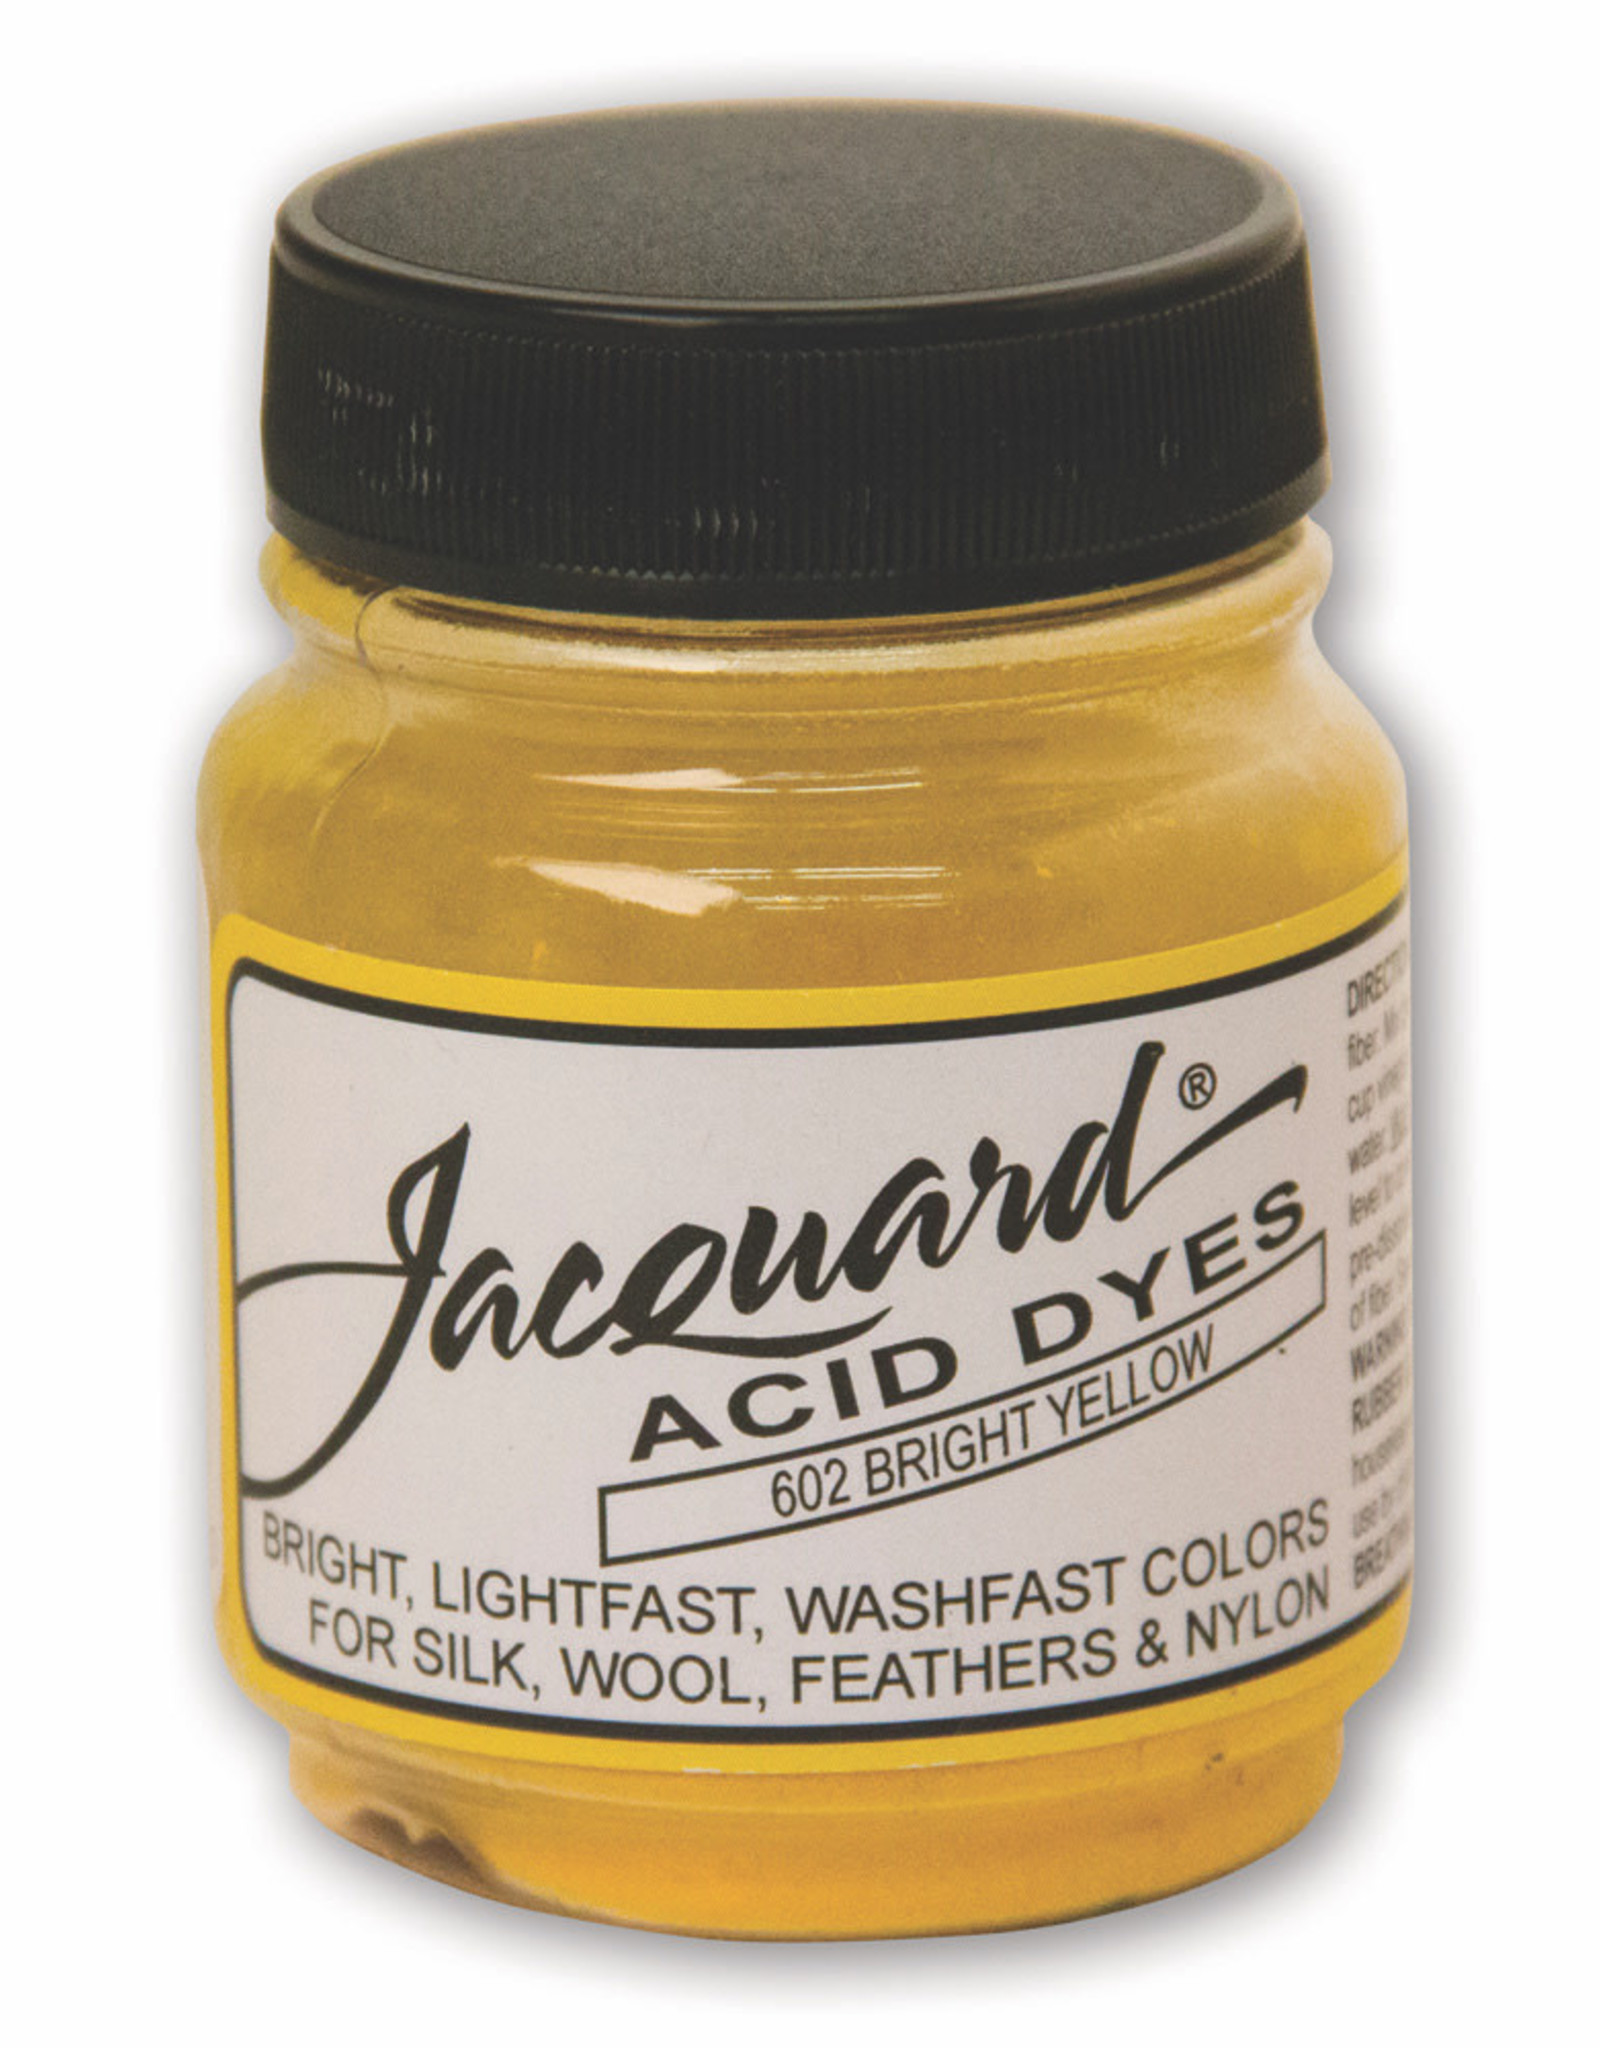 Jacquard Jacquard Acid Dye #602 Bright Yellow 1/2oz